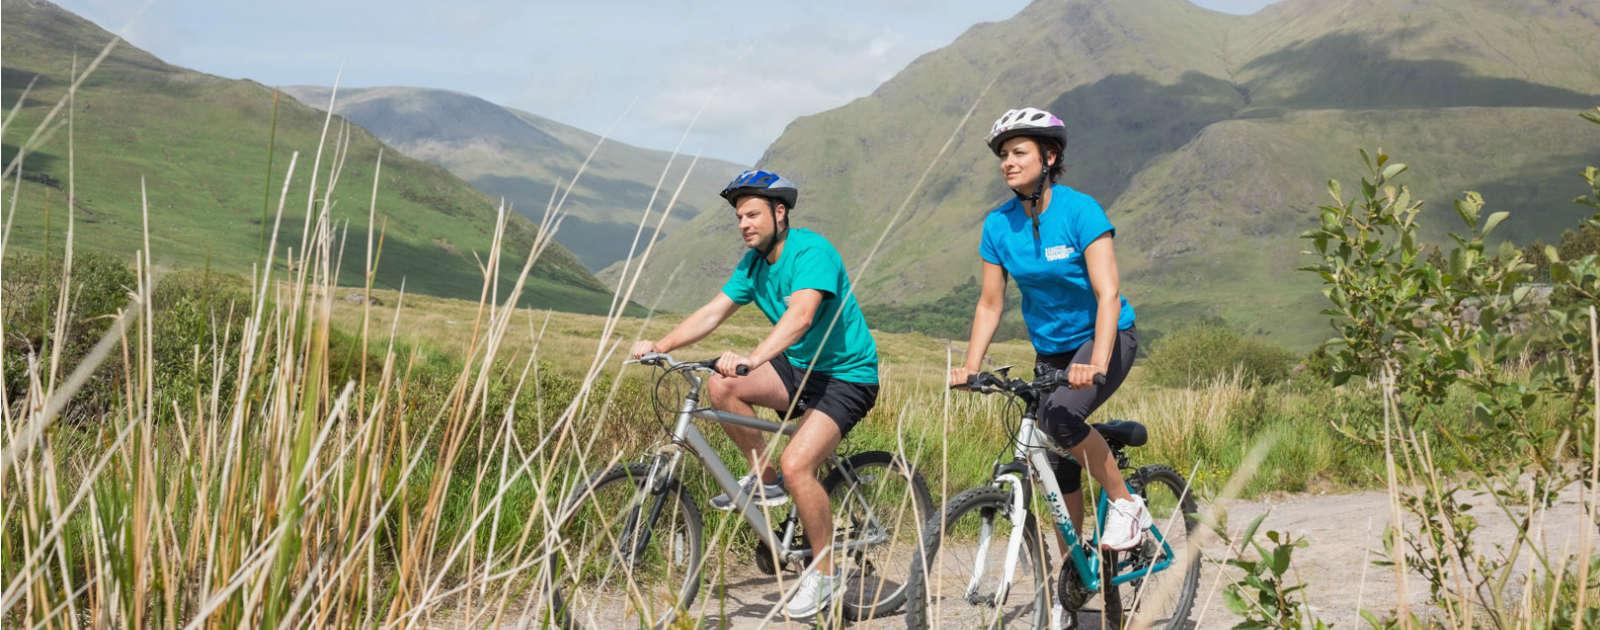 cycling-connemara